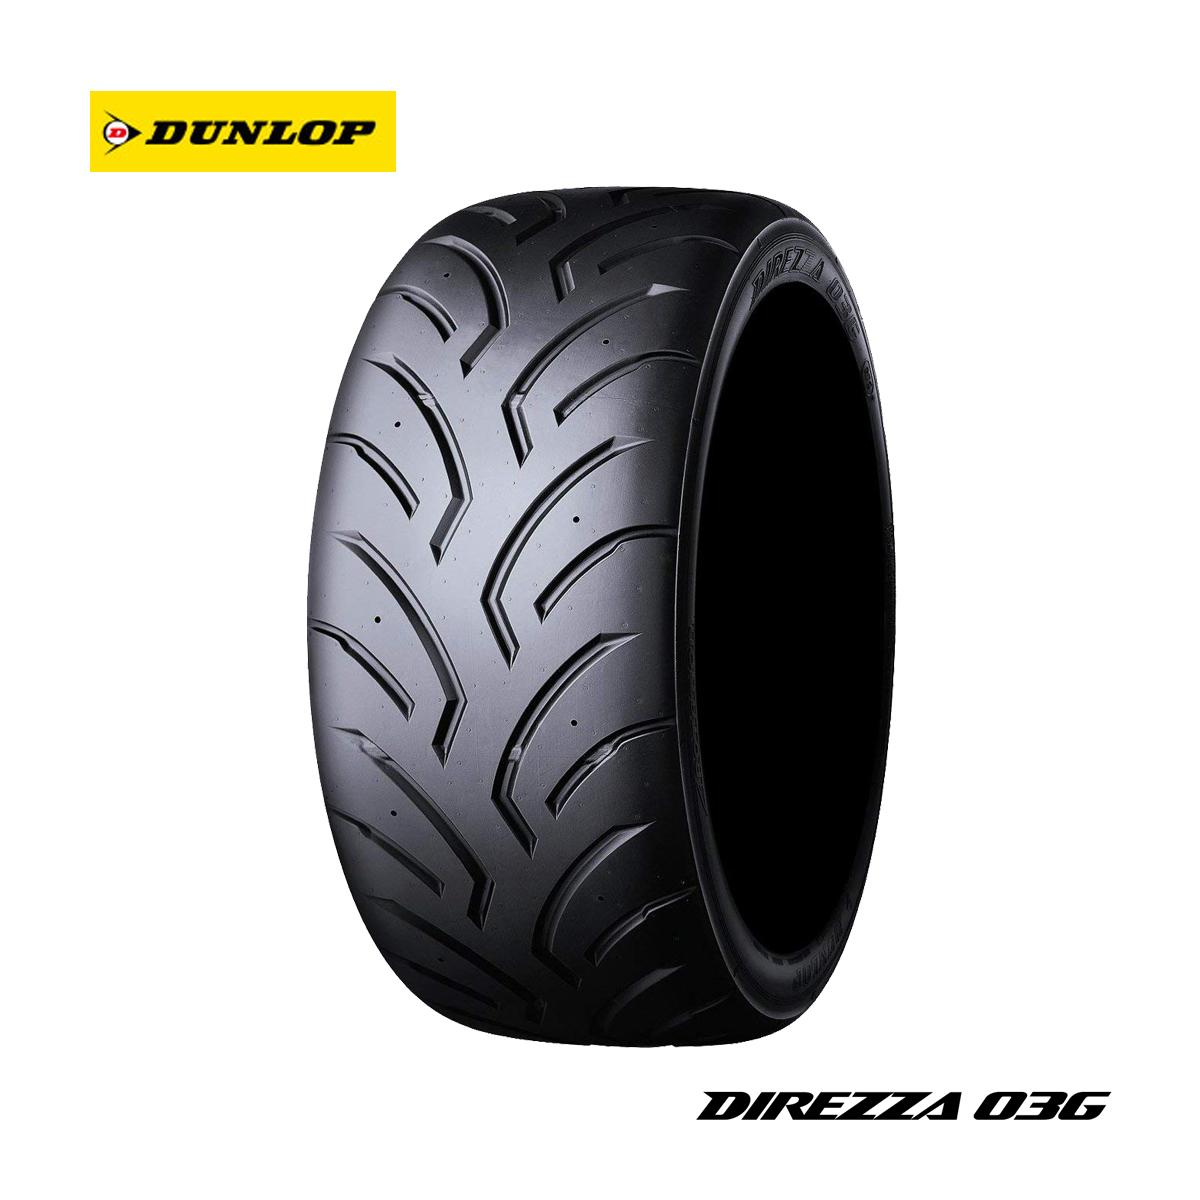 DUNLOPダンロップ国産Sタイヤハイグリップモータースポーツ1本15インチ205/50R15DIREZZAディレッツァ03GコンパウンドS4